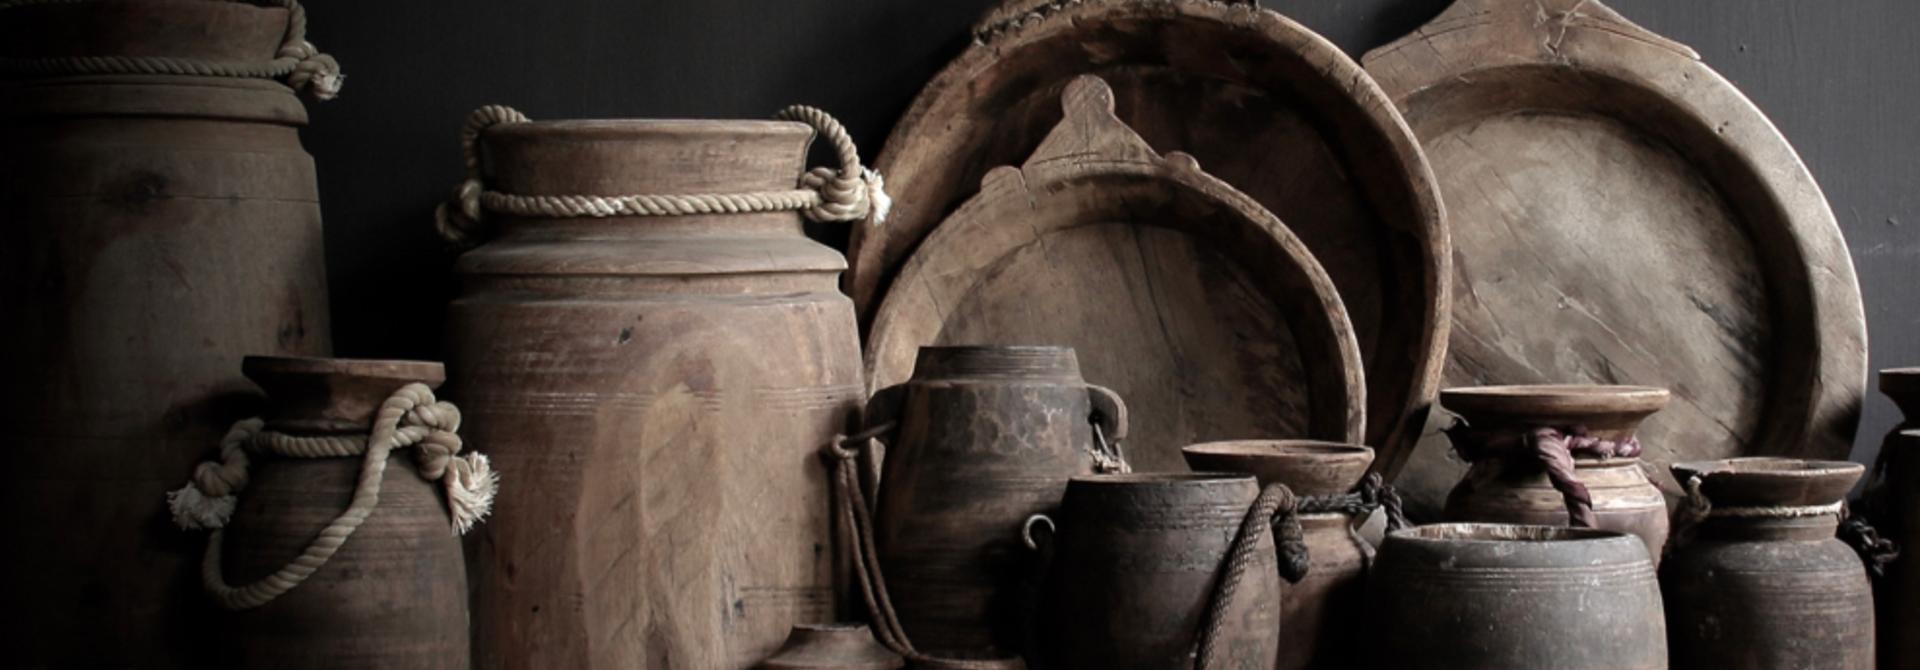 Jars, Pots & Scales